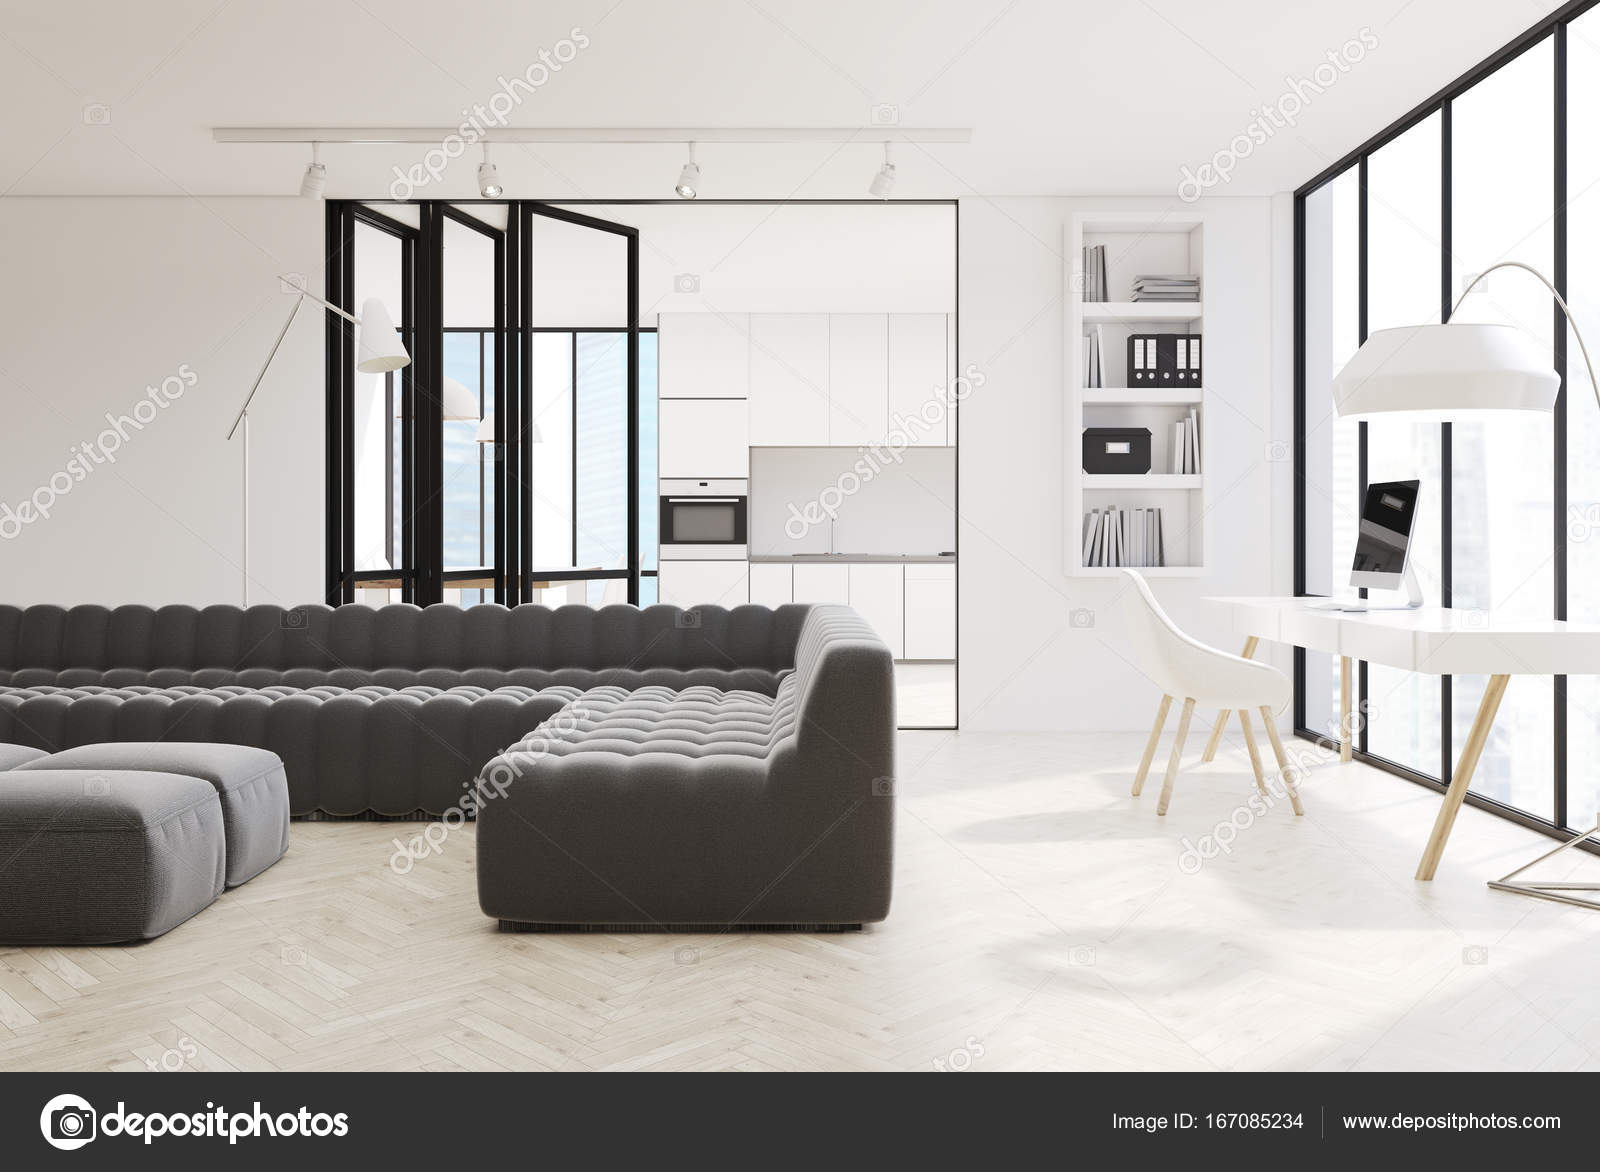 Divani Bianchi E Neri : Salone bianco divani interni nero u foto stock denisismagilov